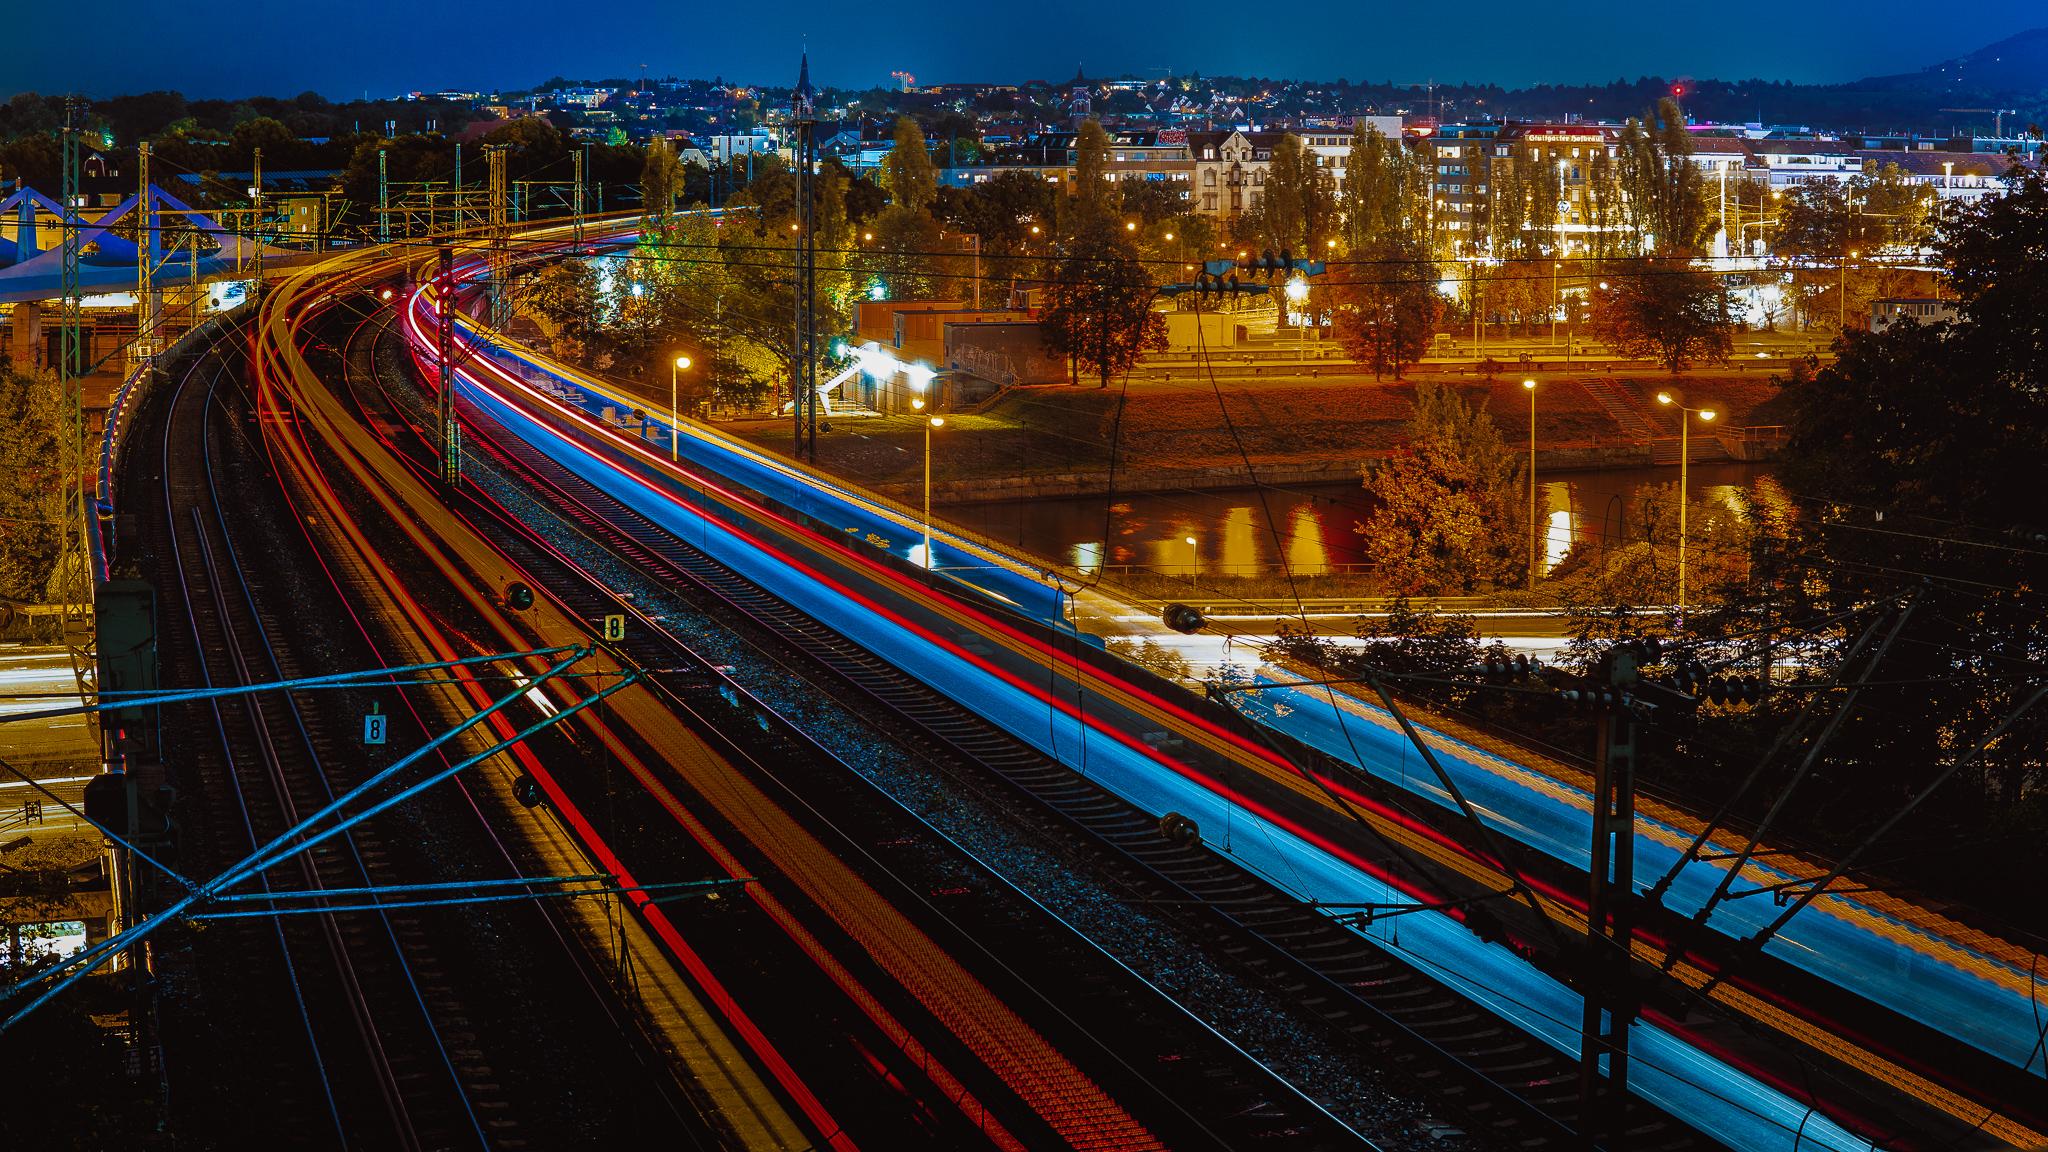 Rosensteinpark Trainspotting, Germany